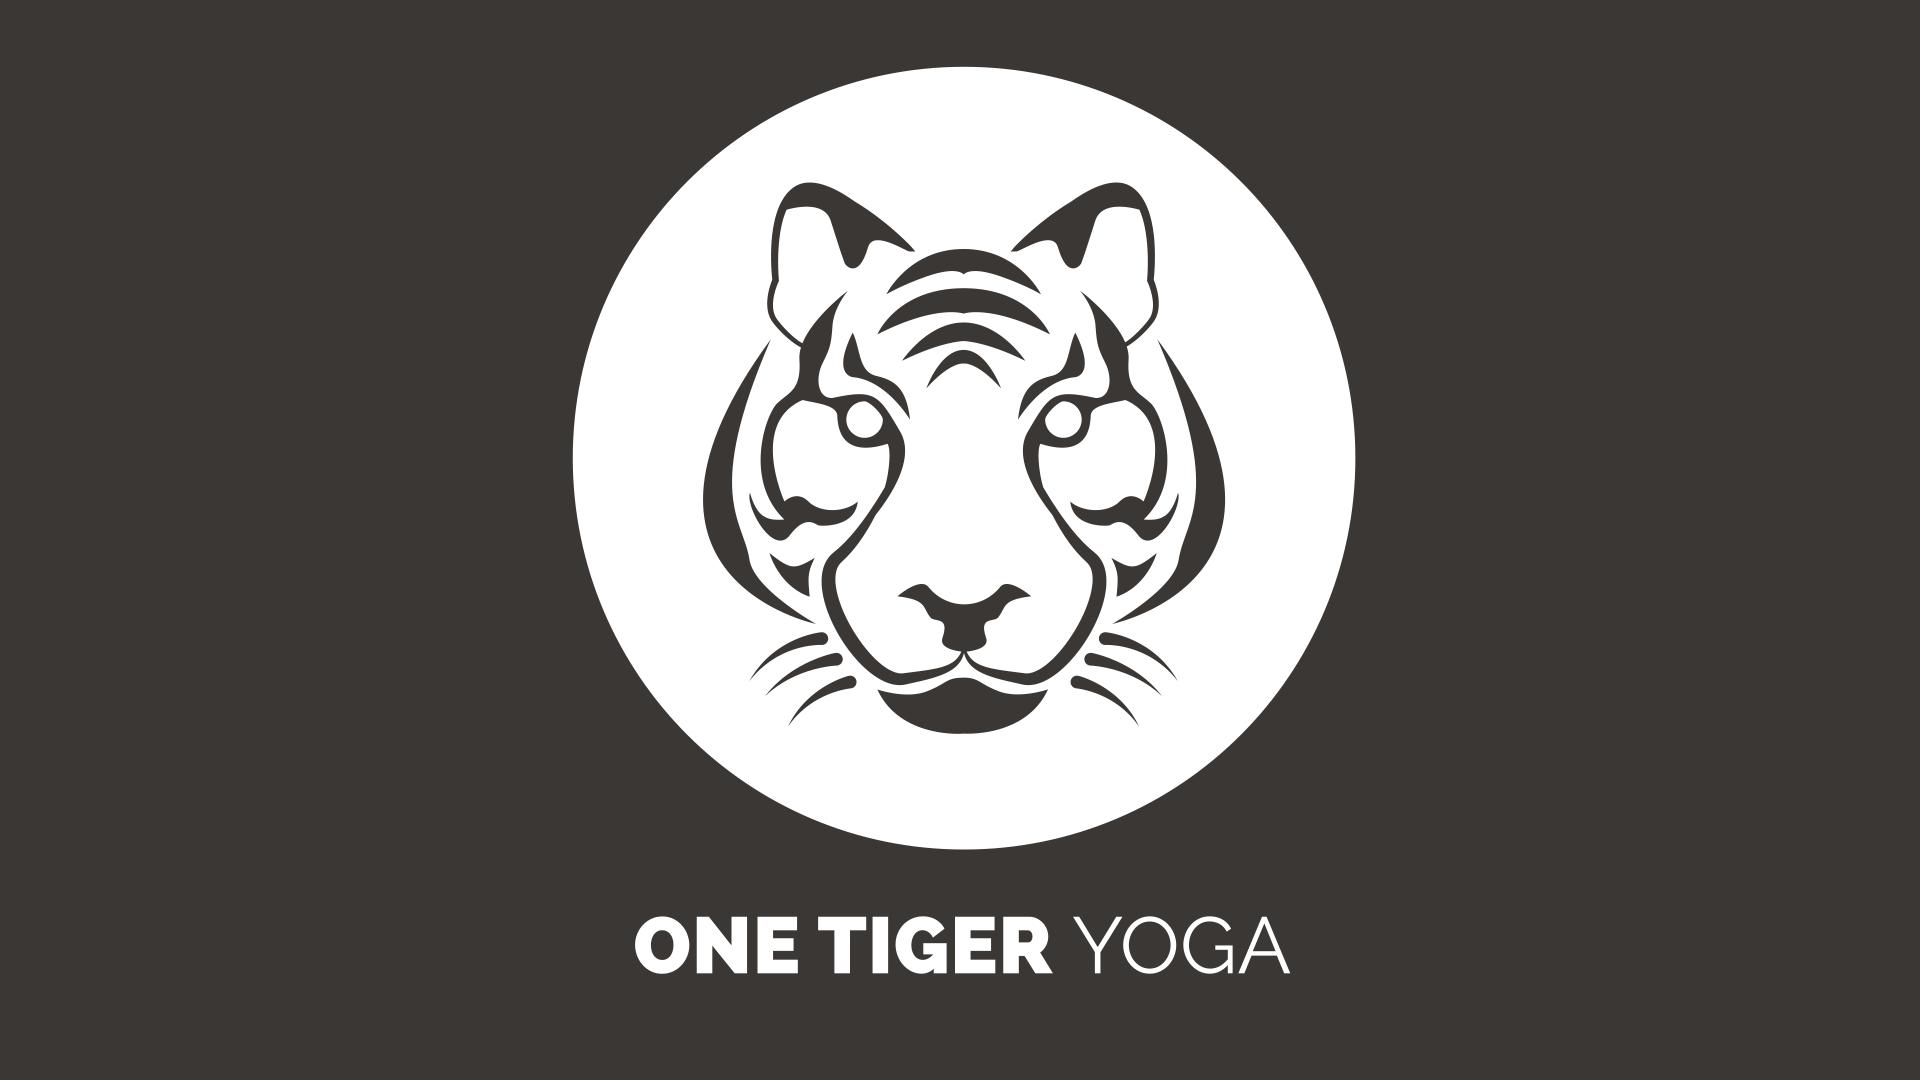 One Tiger Yoga Official Logo